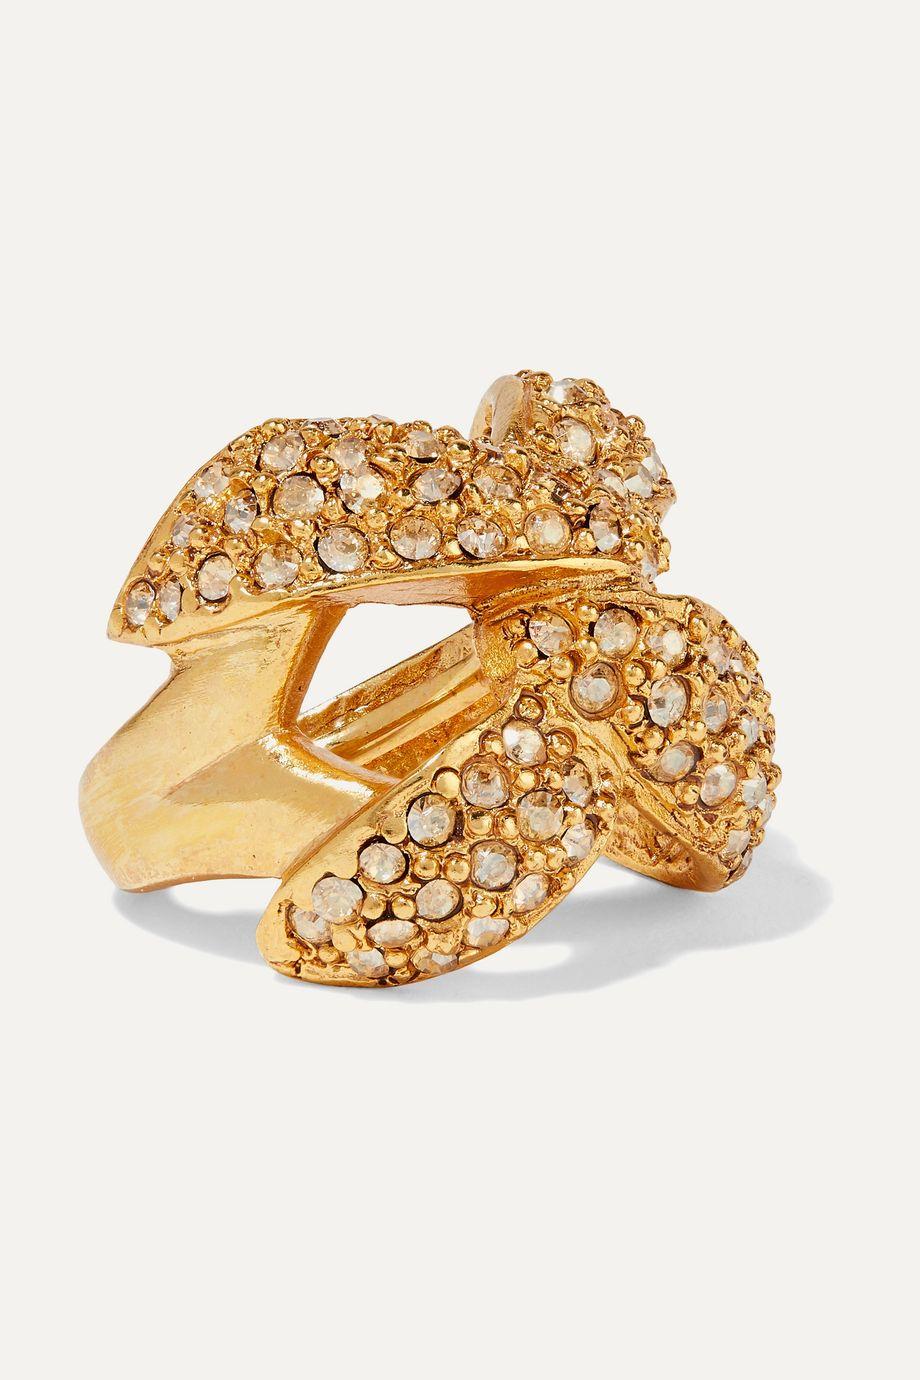 Oscar de la Renta Gold-tone and crystal ring